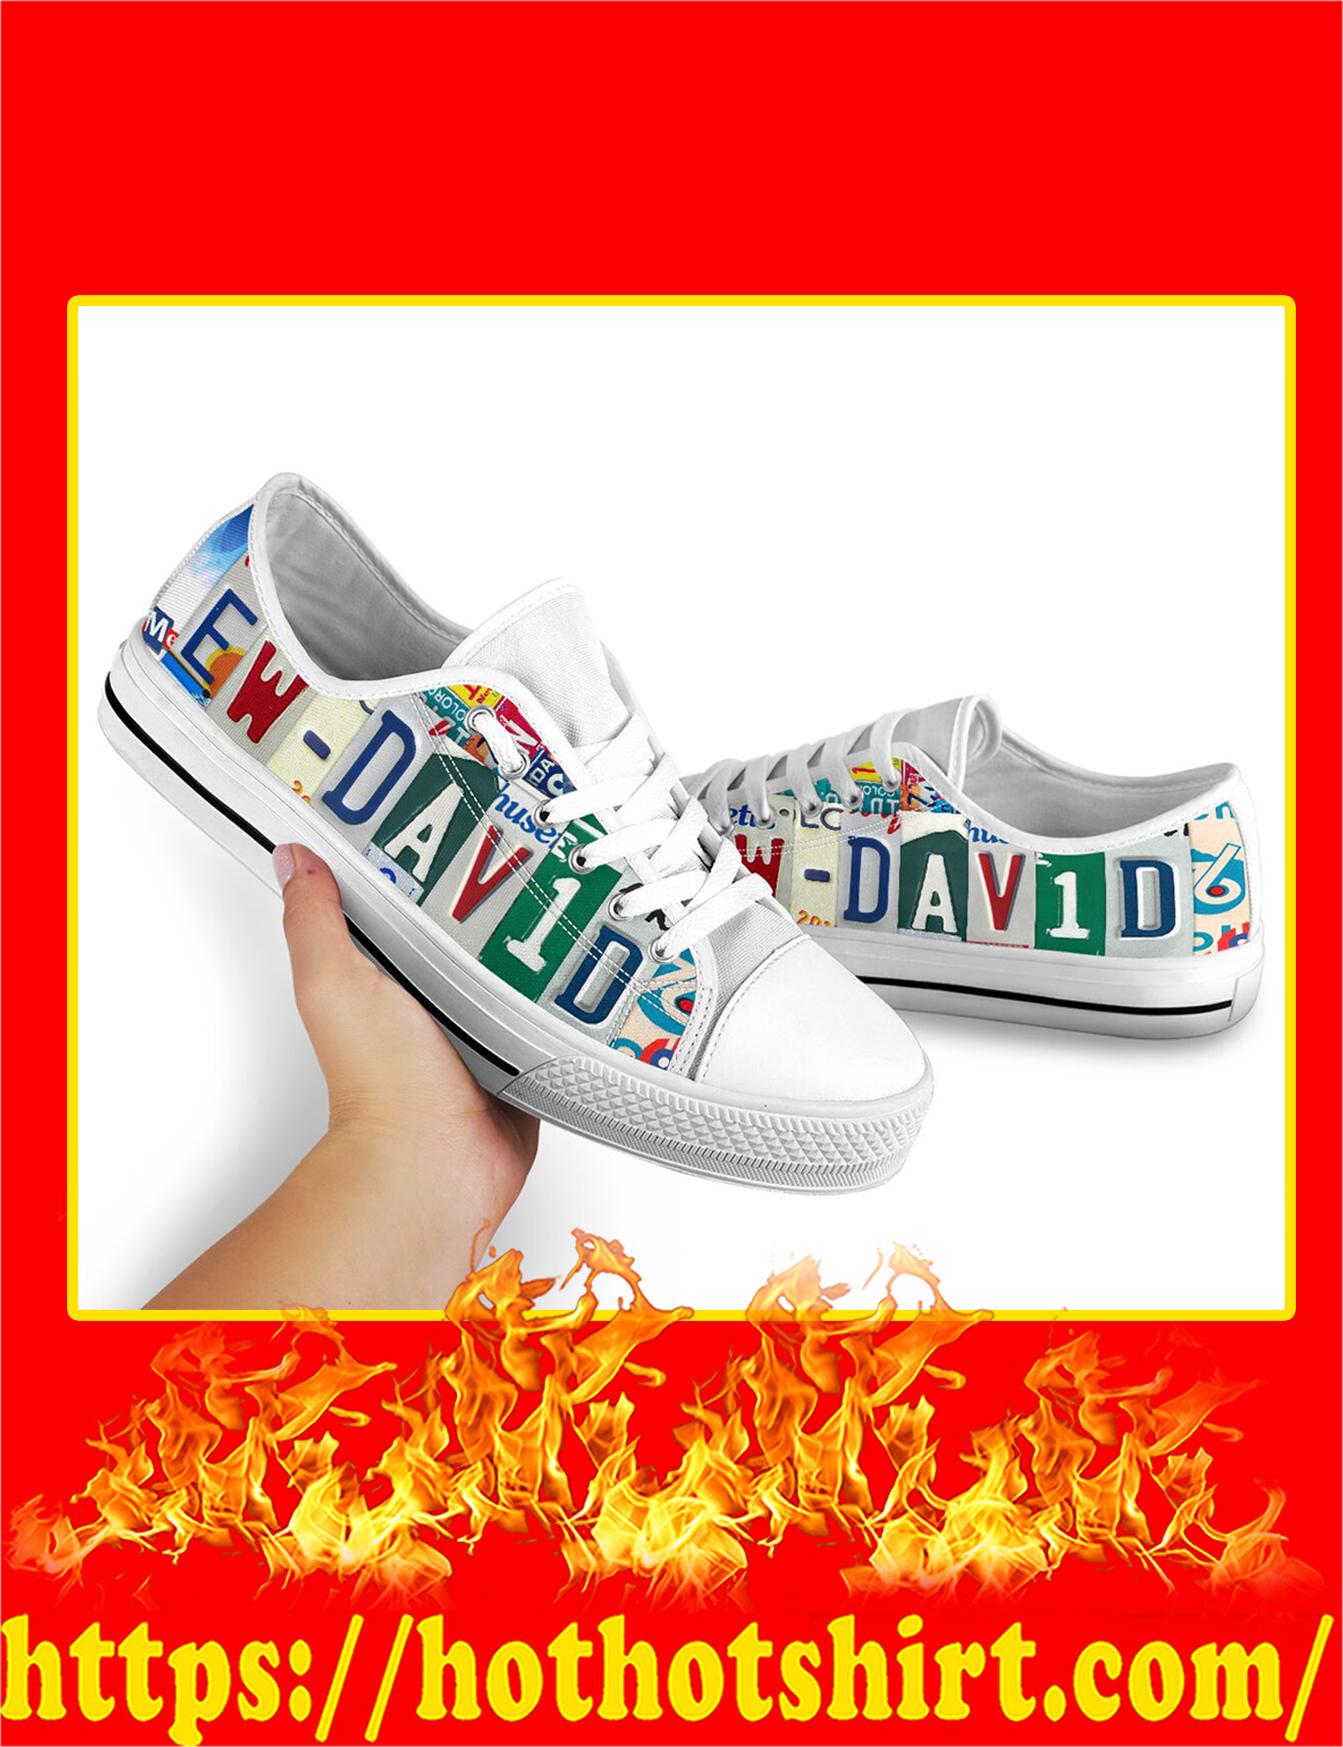 Ew David Low Top Shoes - Pic 2